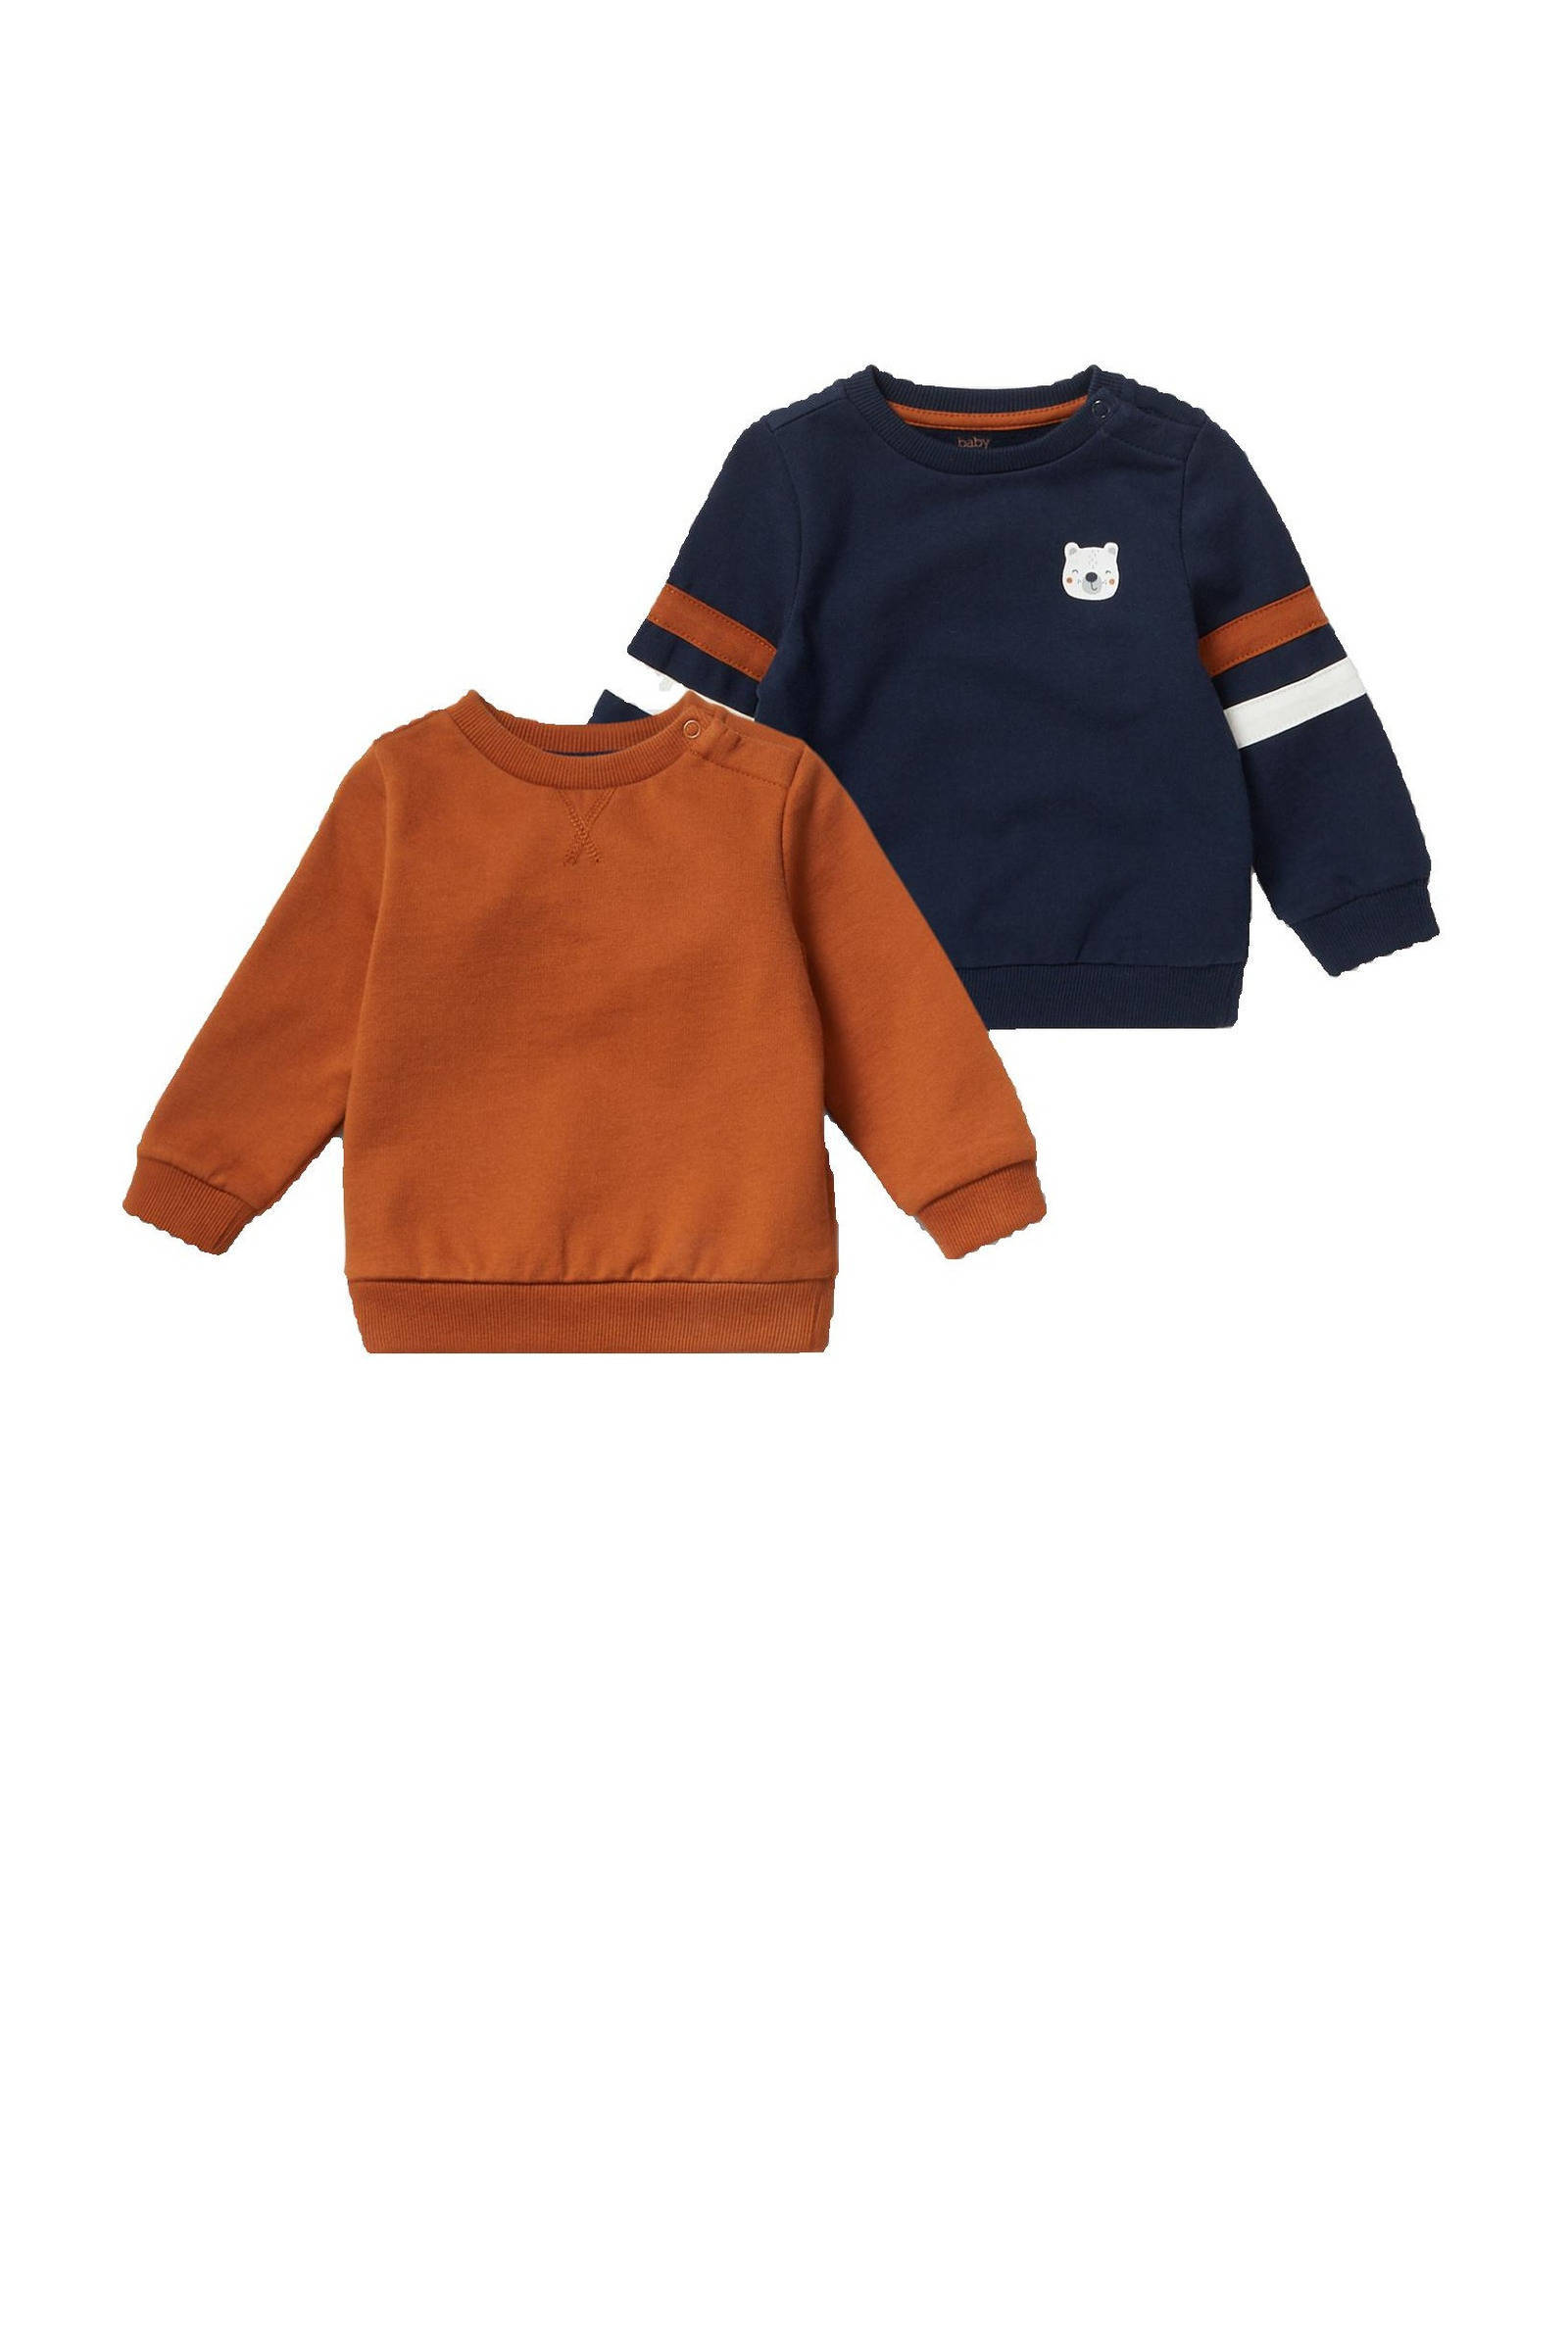 C&A Baby Club sweater set van 2 roodwitdonkerblauw | wehkamp